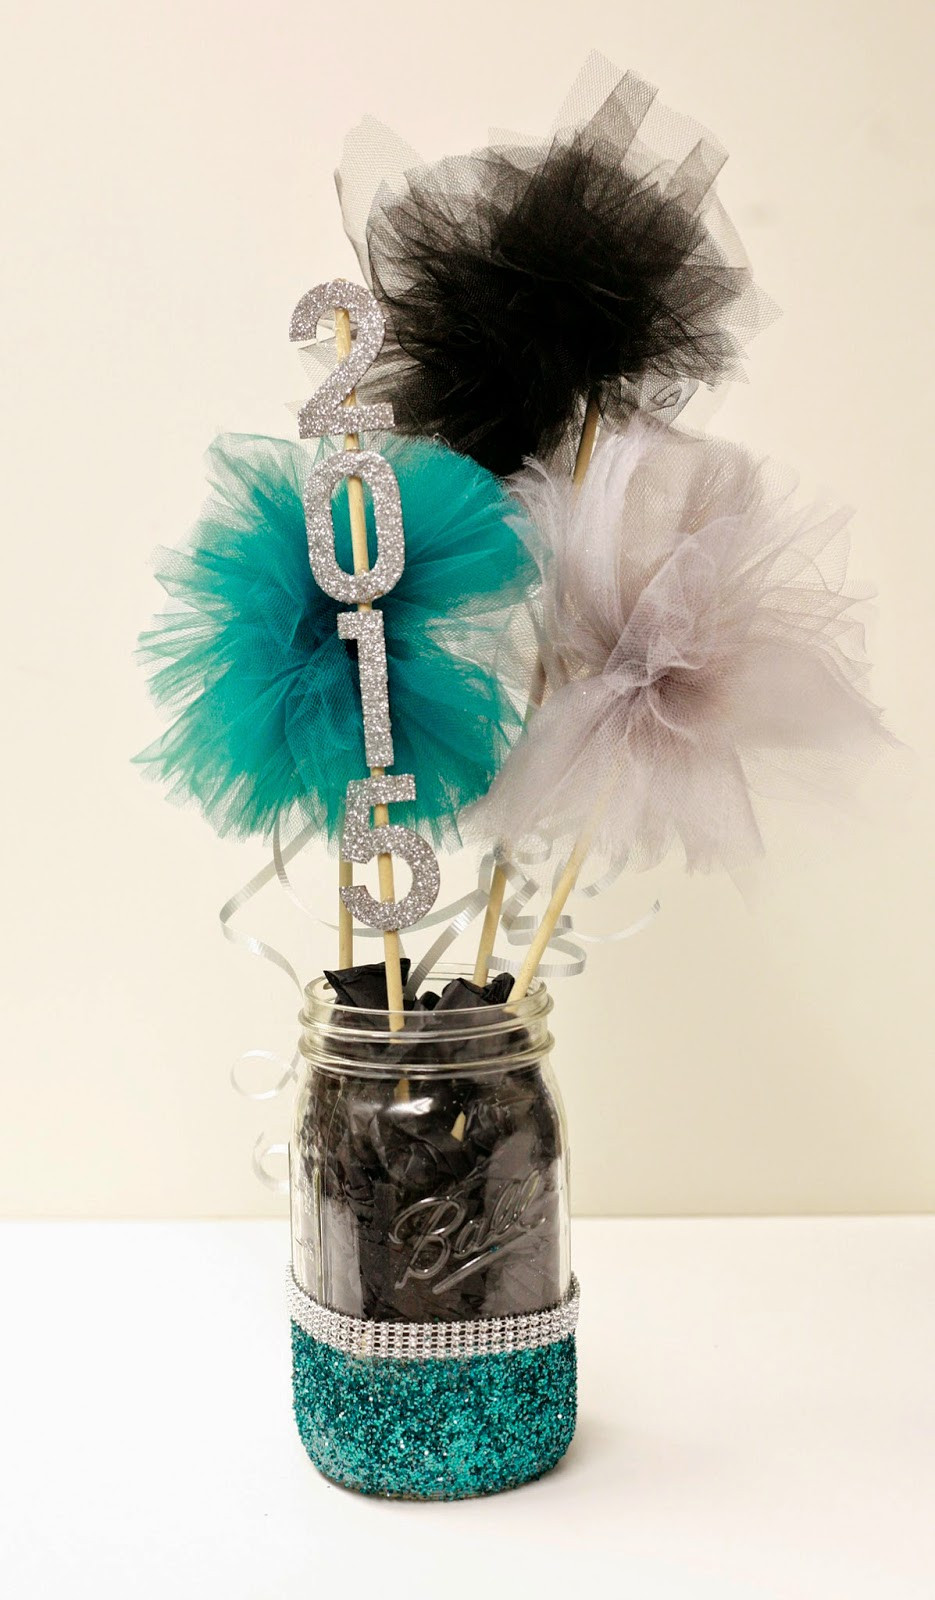 Graduation Party Decoration Ideas Diy  Ben Franklin Crafts and Frame Shop DIY Graduation Party Decor